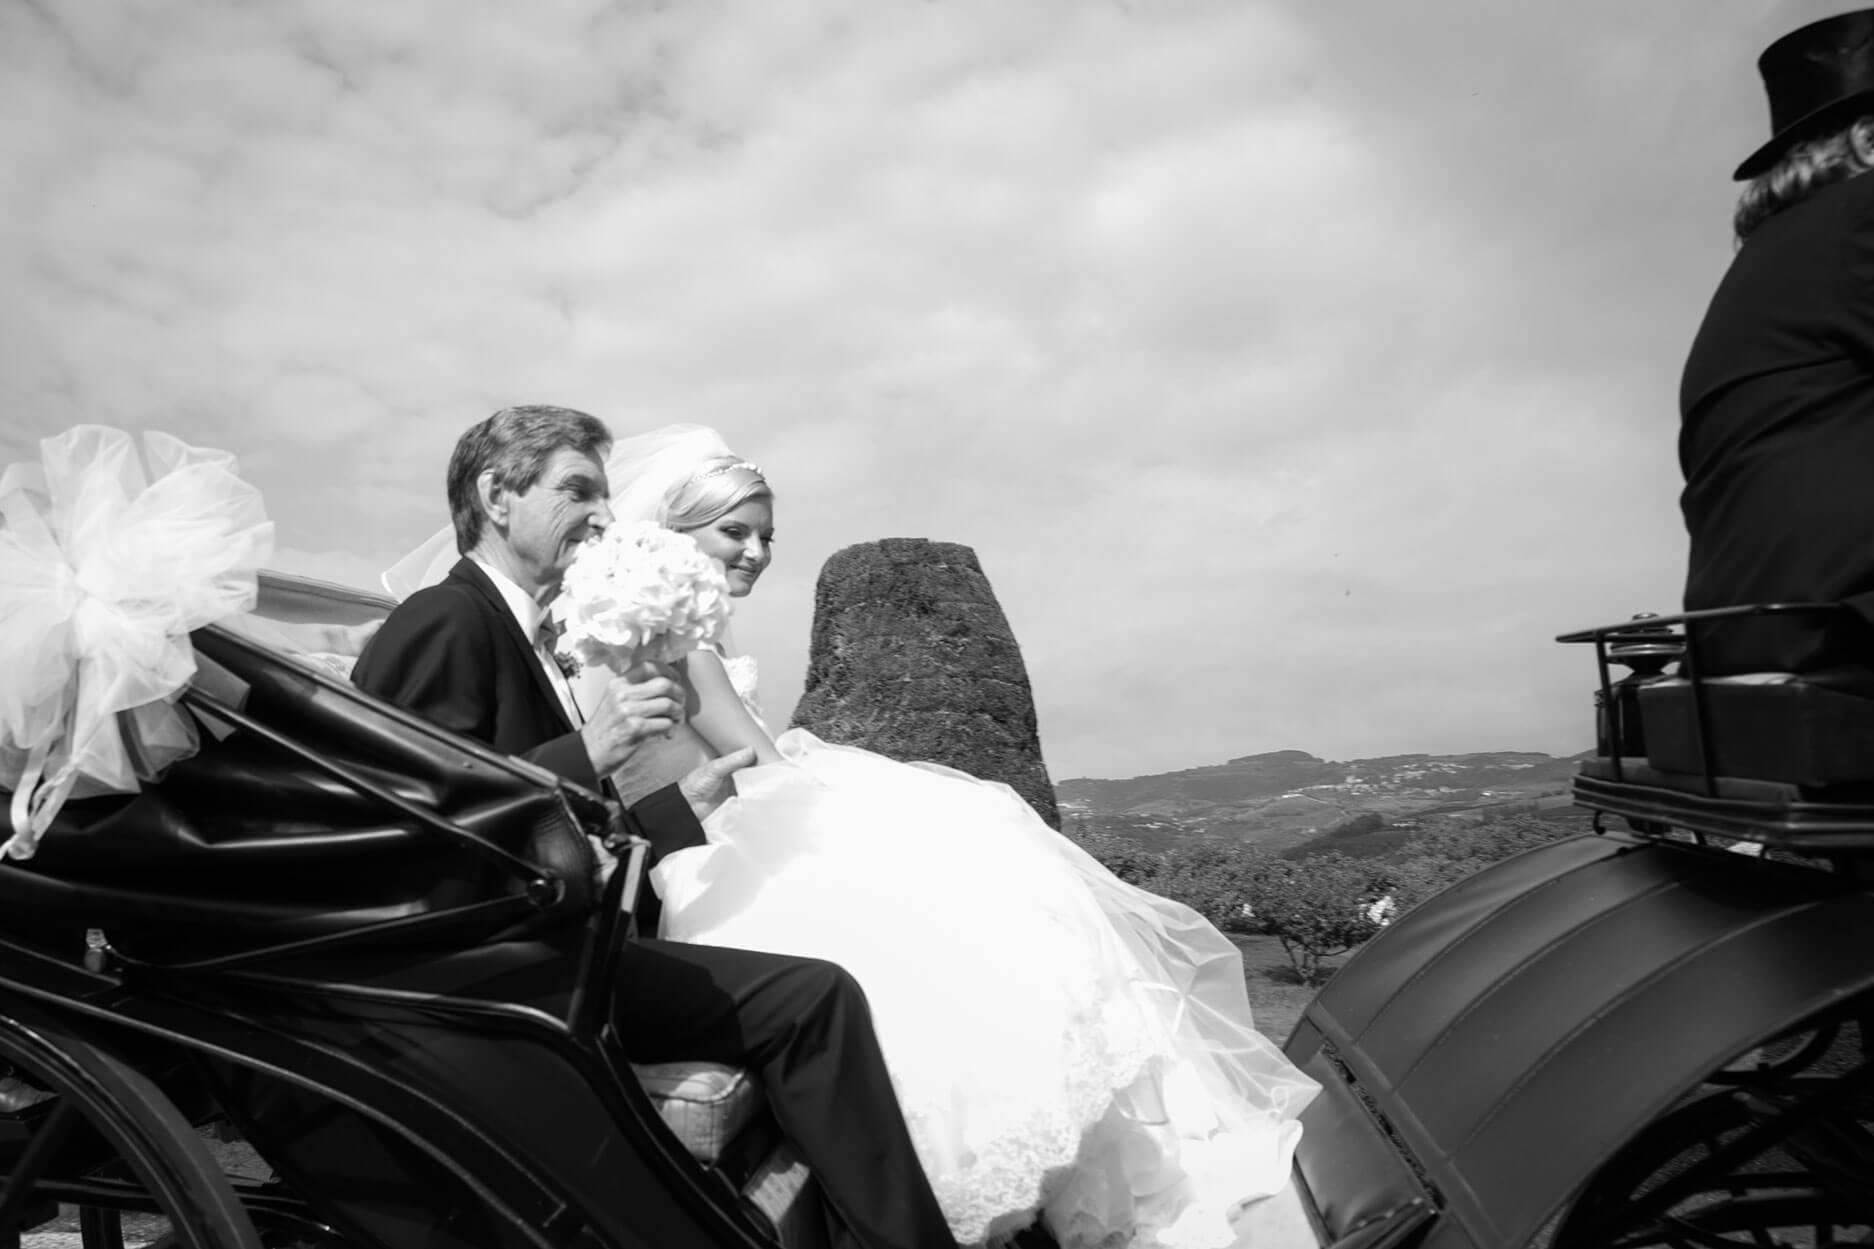 Francesca-Ferrati-wedding-photographer-Verona-Svetlana-Gianluigi13